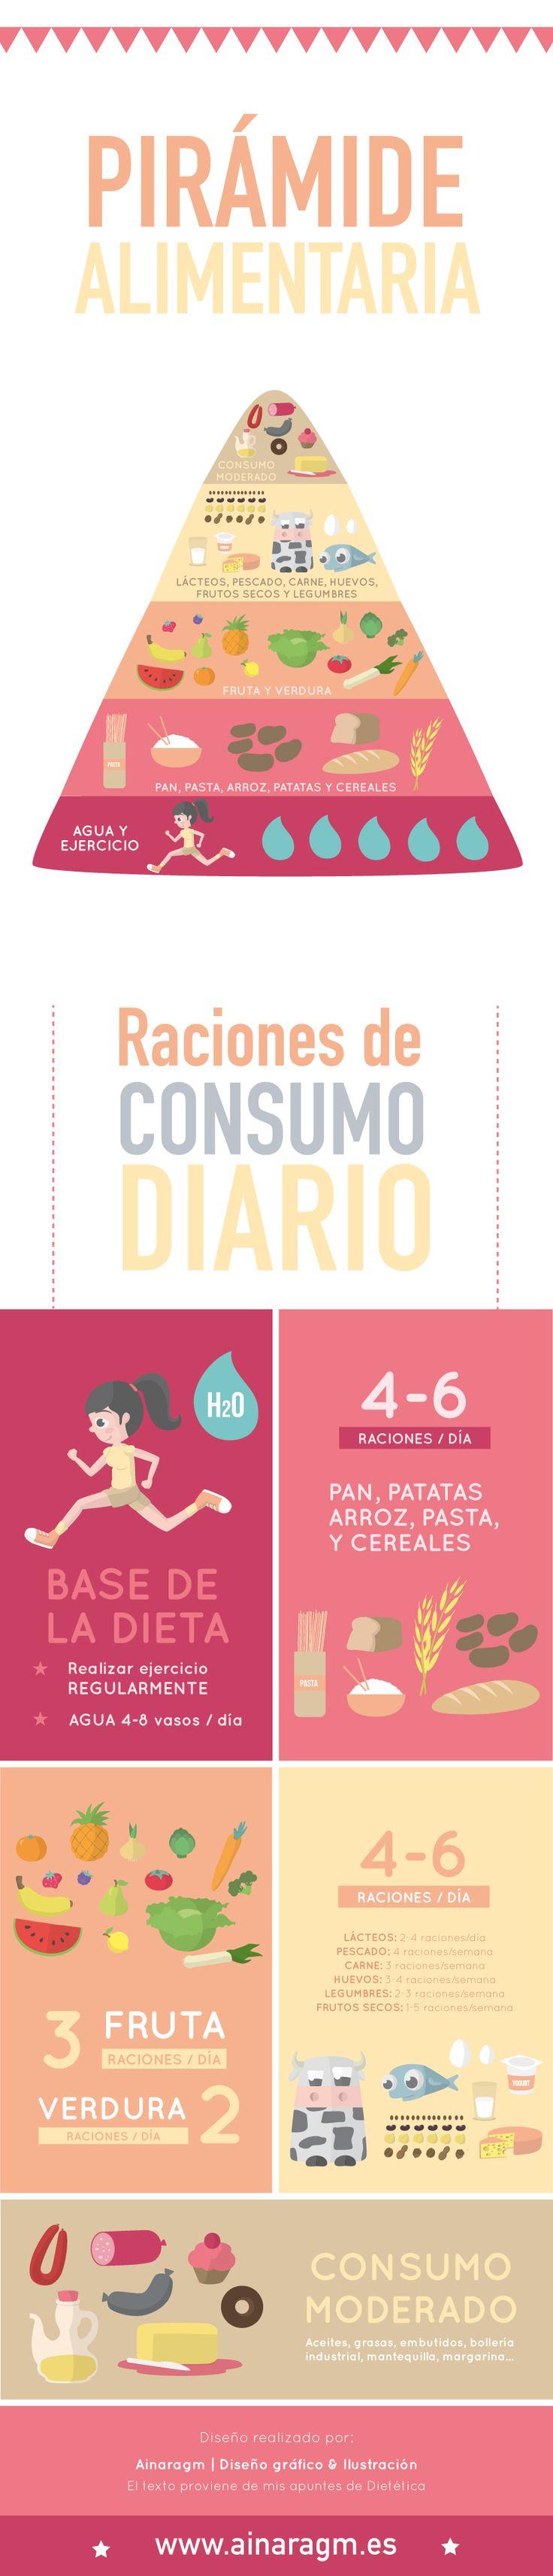 #Infografia sobre la pirámide alimentaria #dieta #nutricion #alimentos